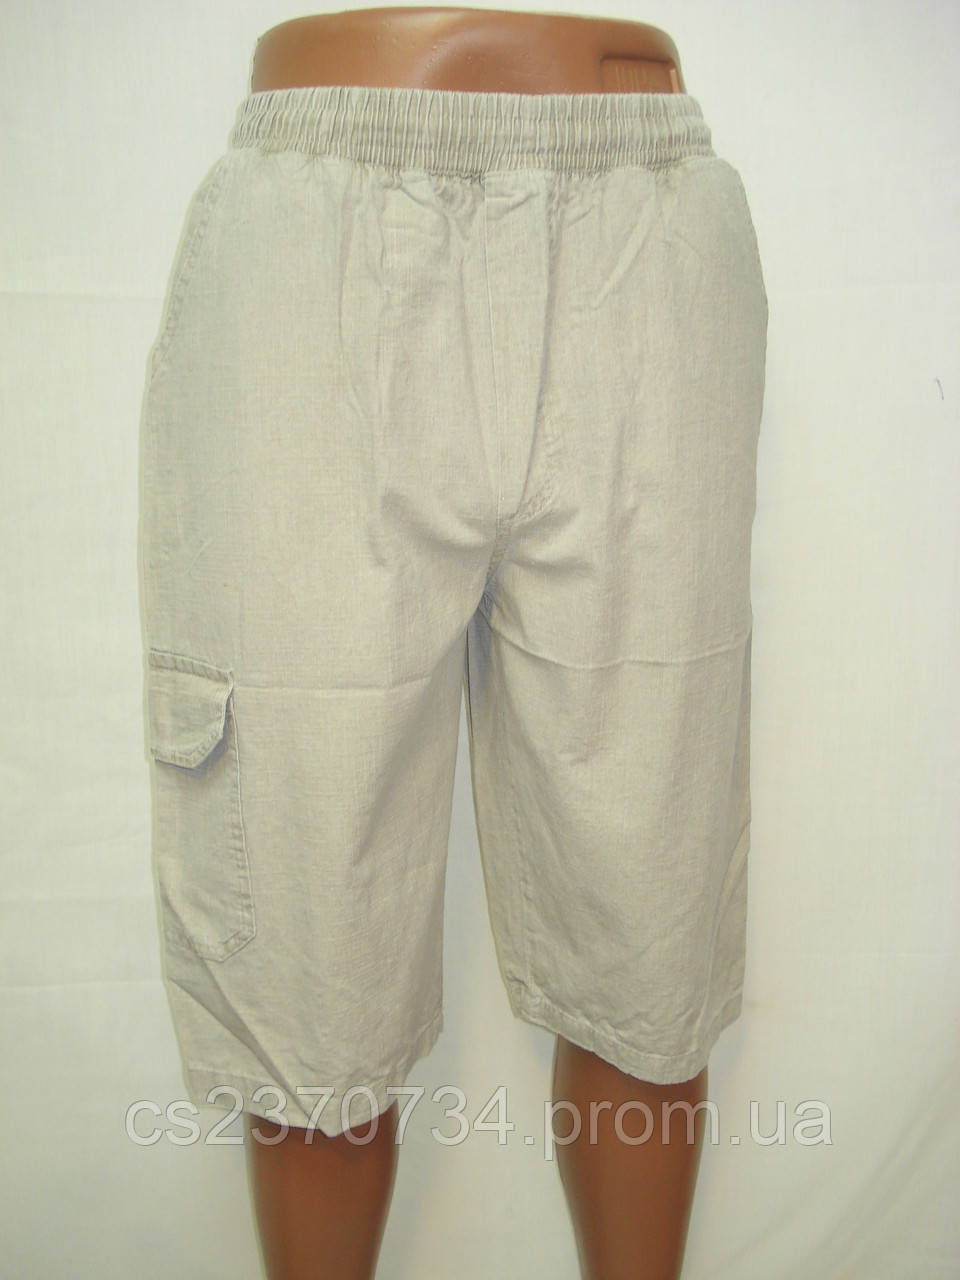 Бриджи мужские ARMA на резинке ,бежевые  40,42,44,46 размер